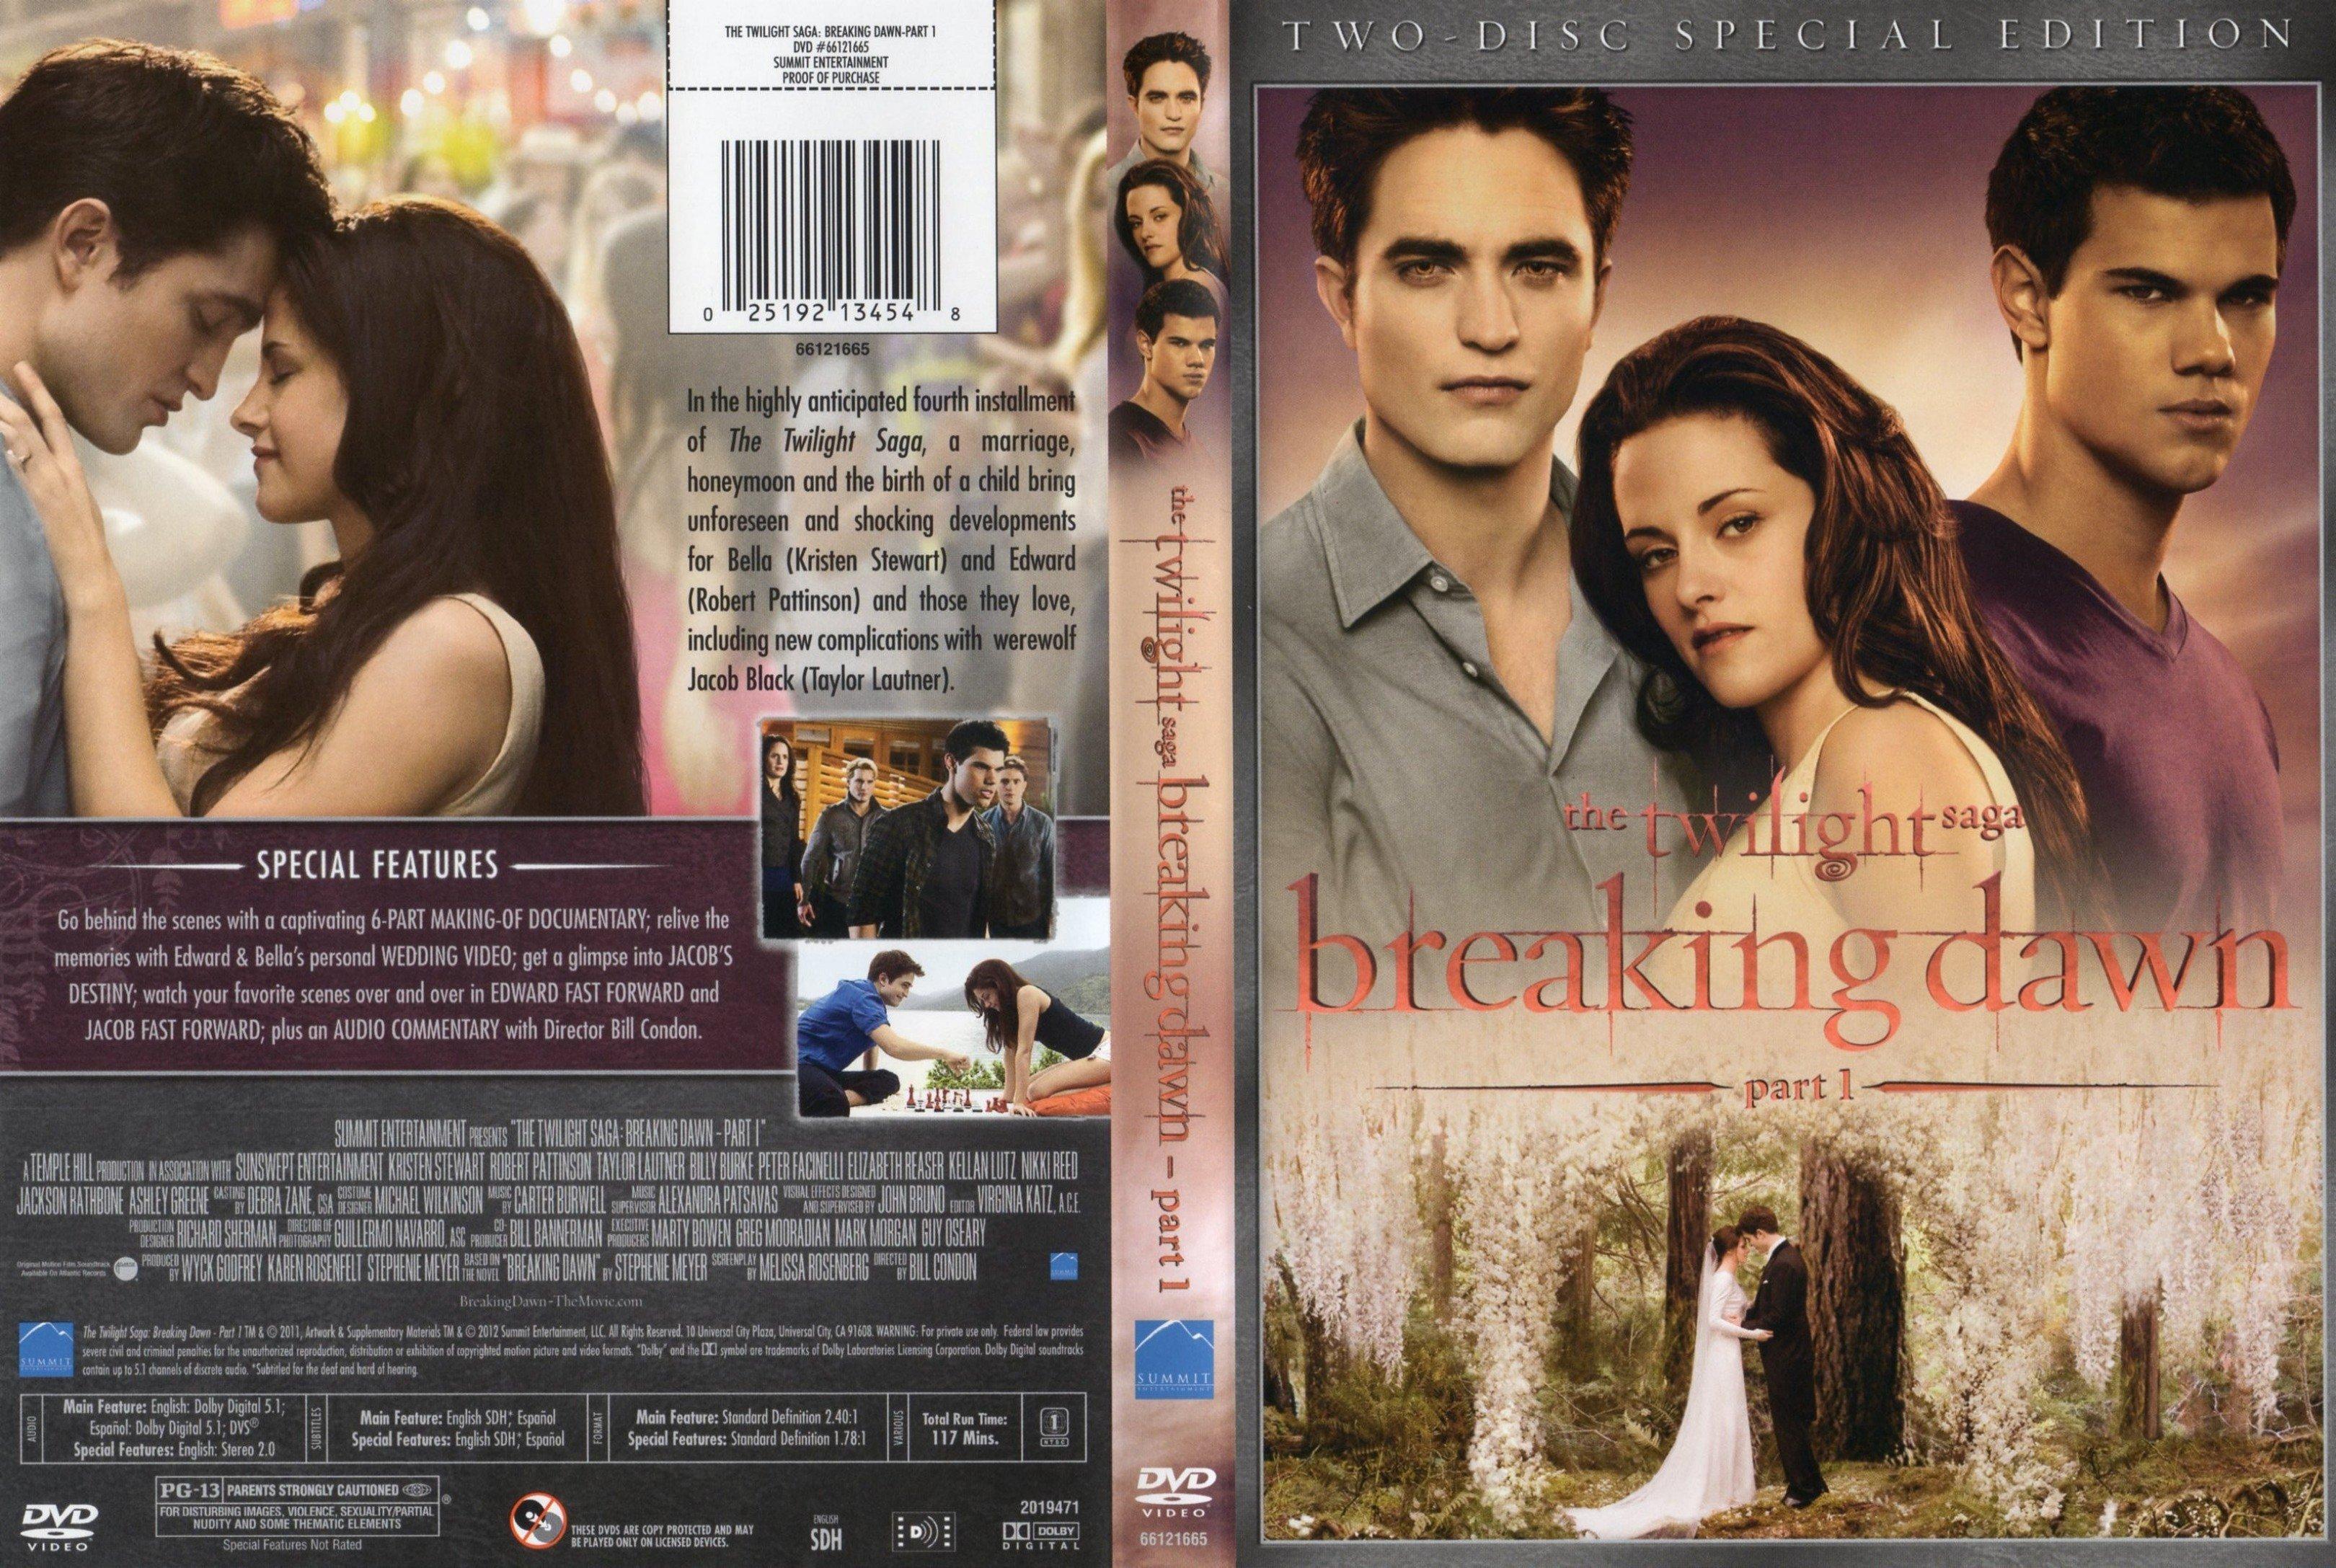 twilight breaking dawn part 1 book free download